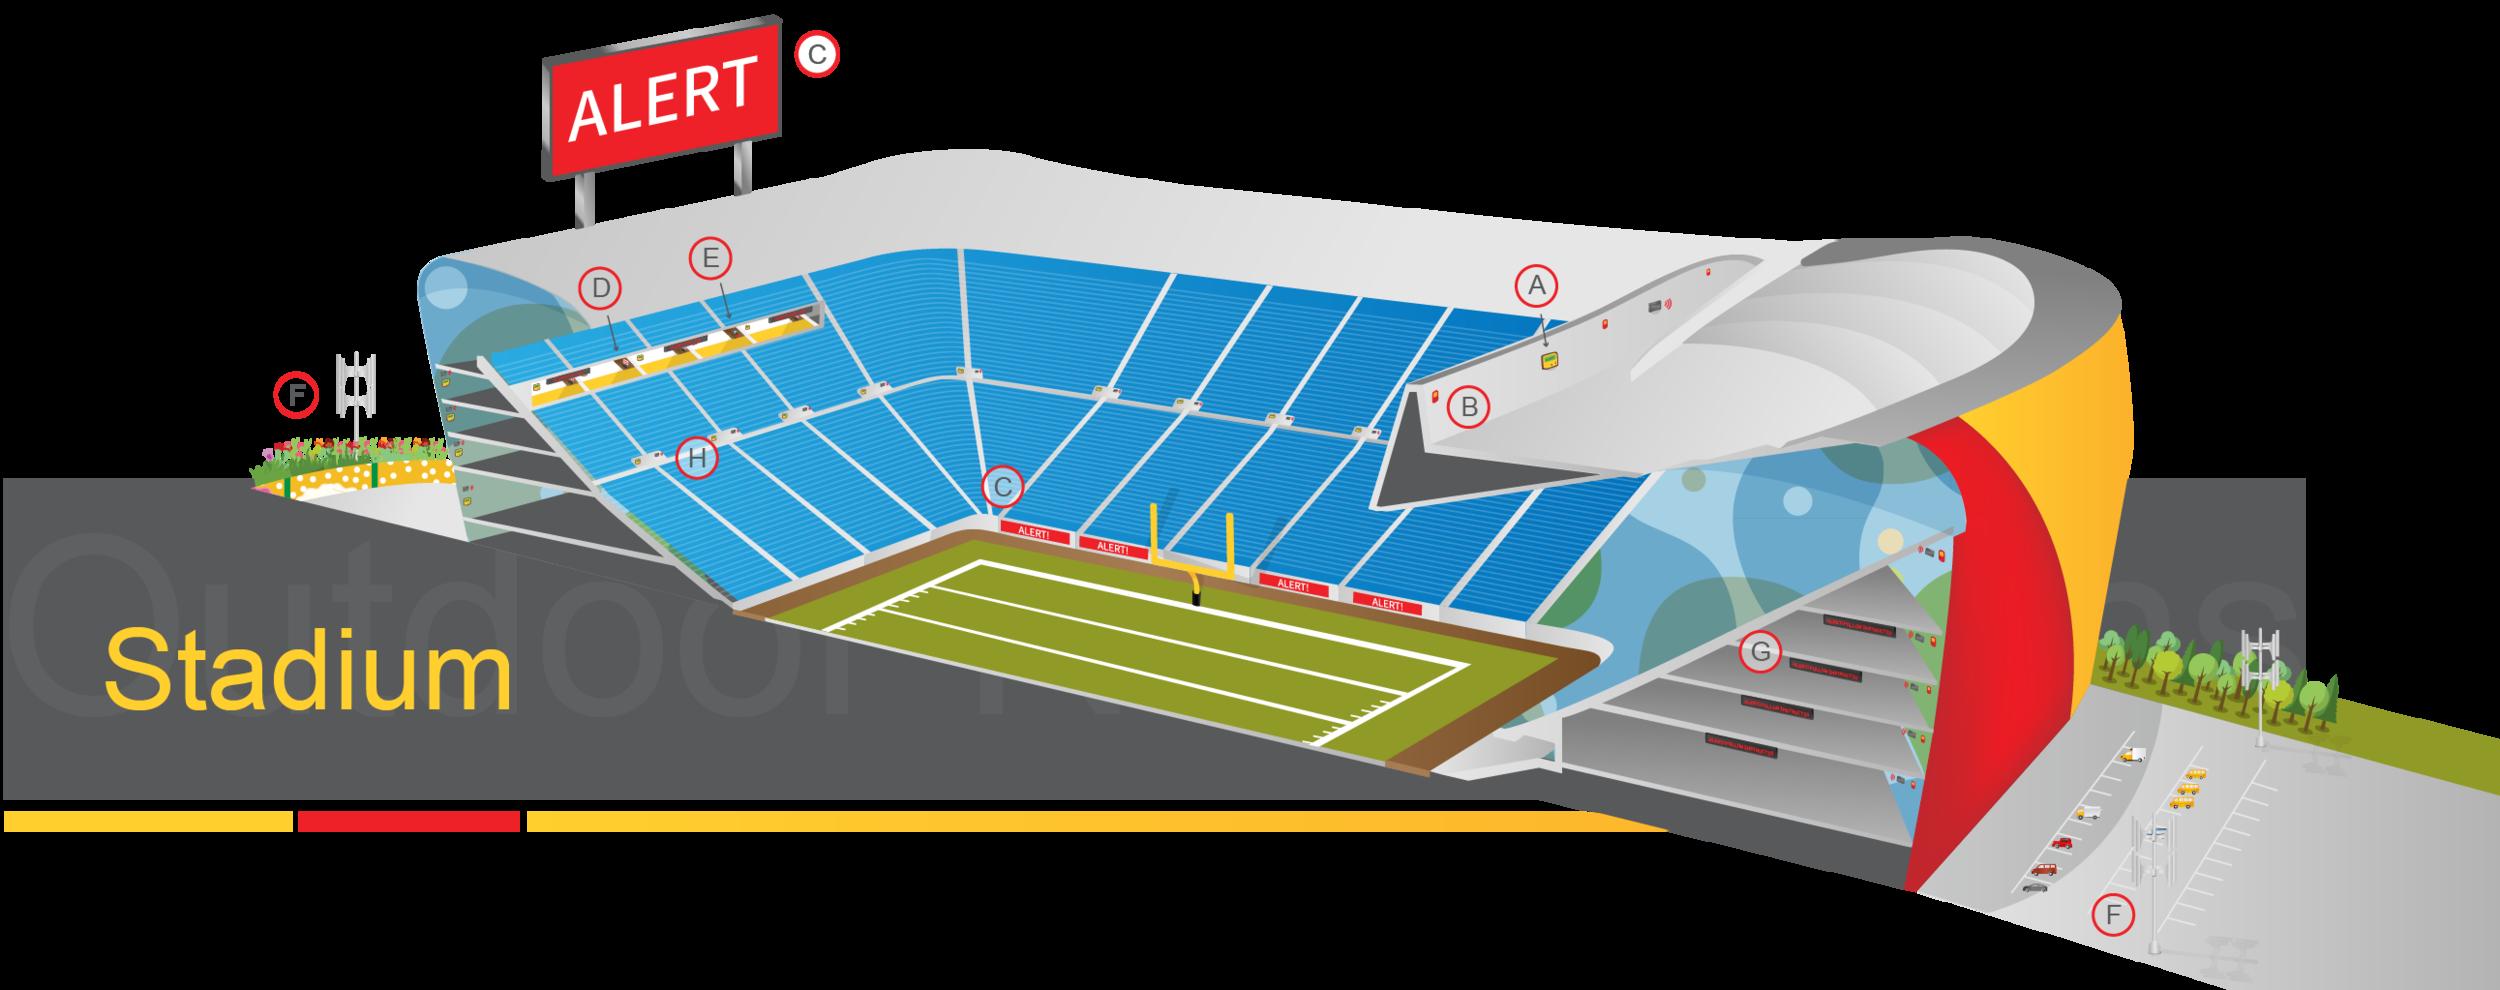 linecard_stadium_base_2017@3x.png